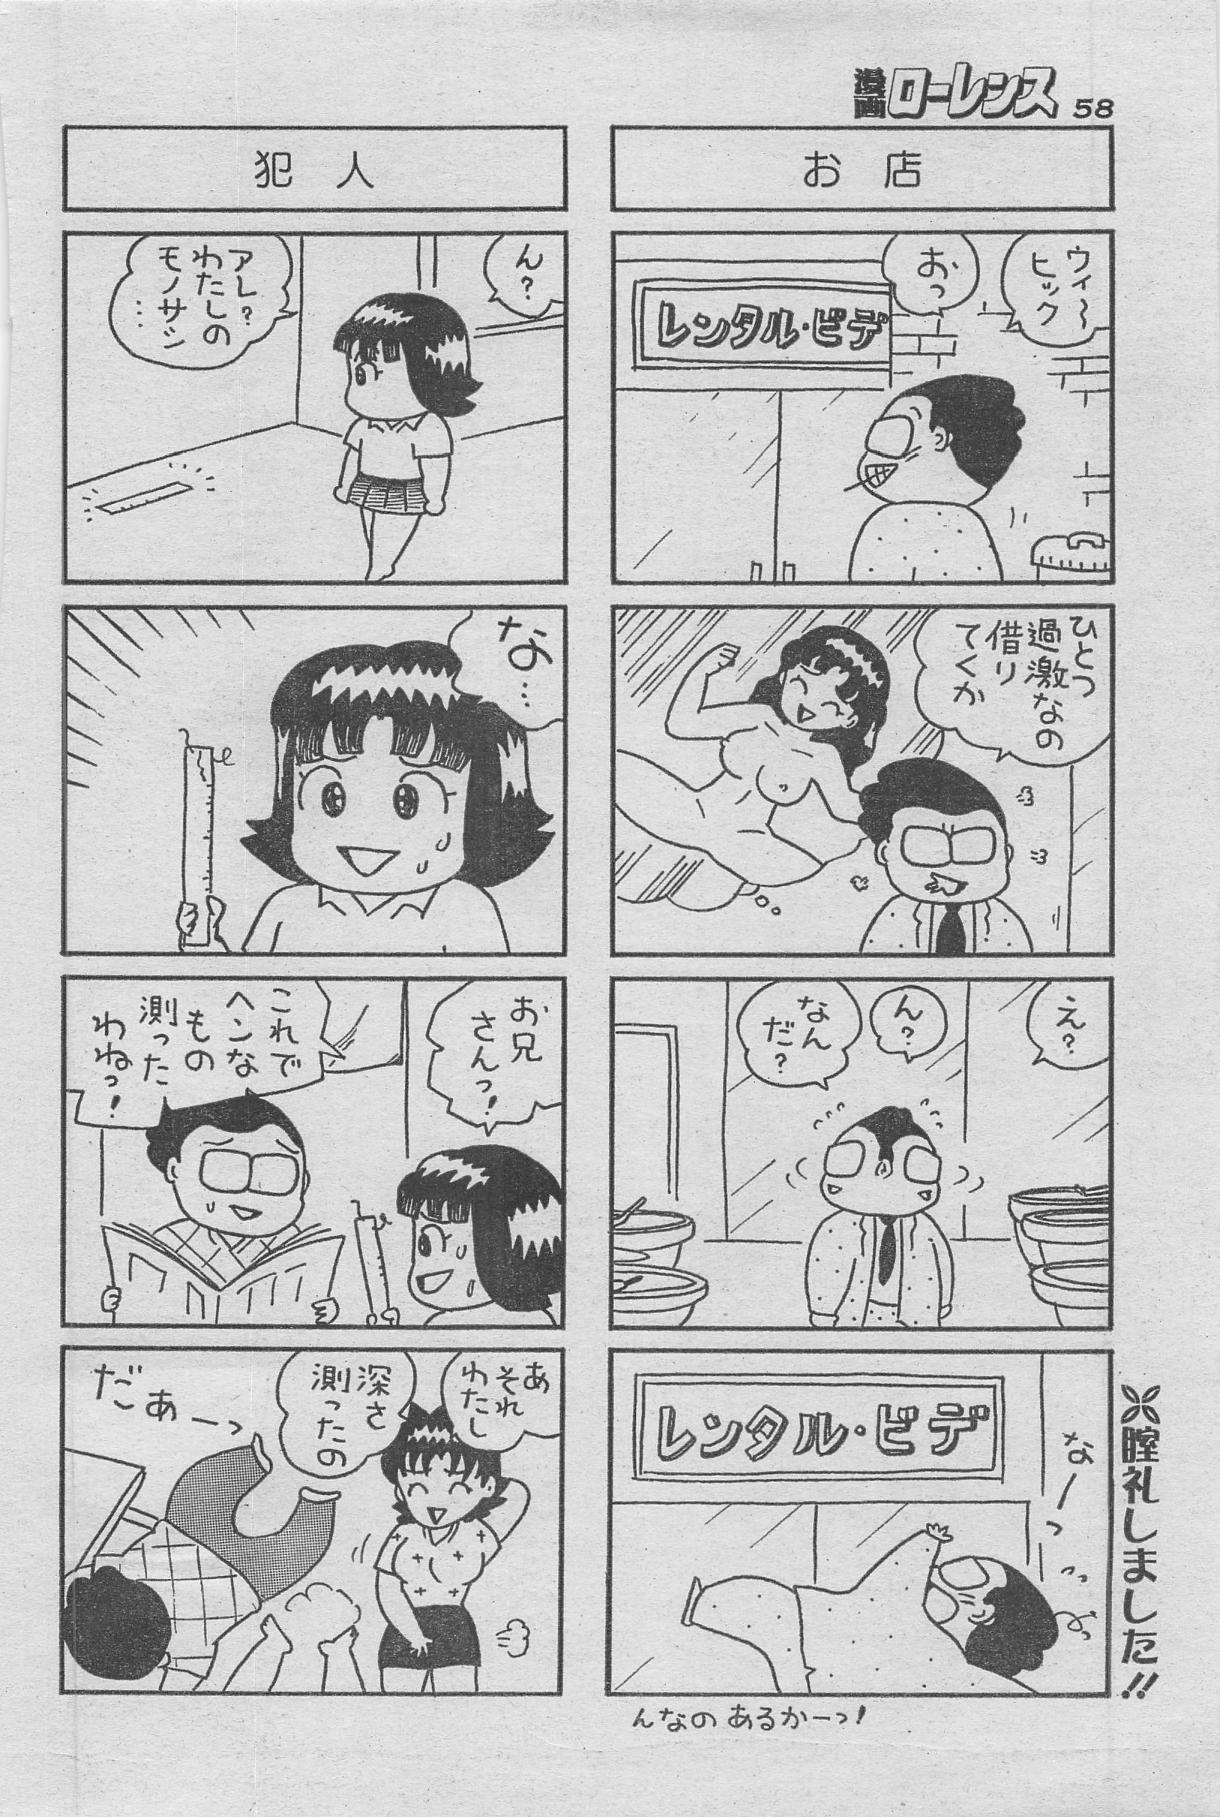 Manga Lawrence 2013-04 45